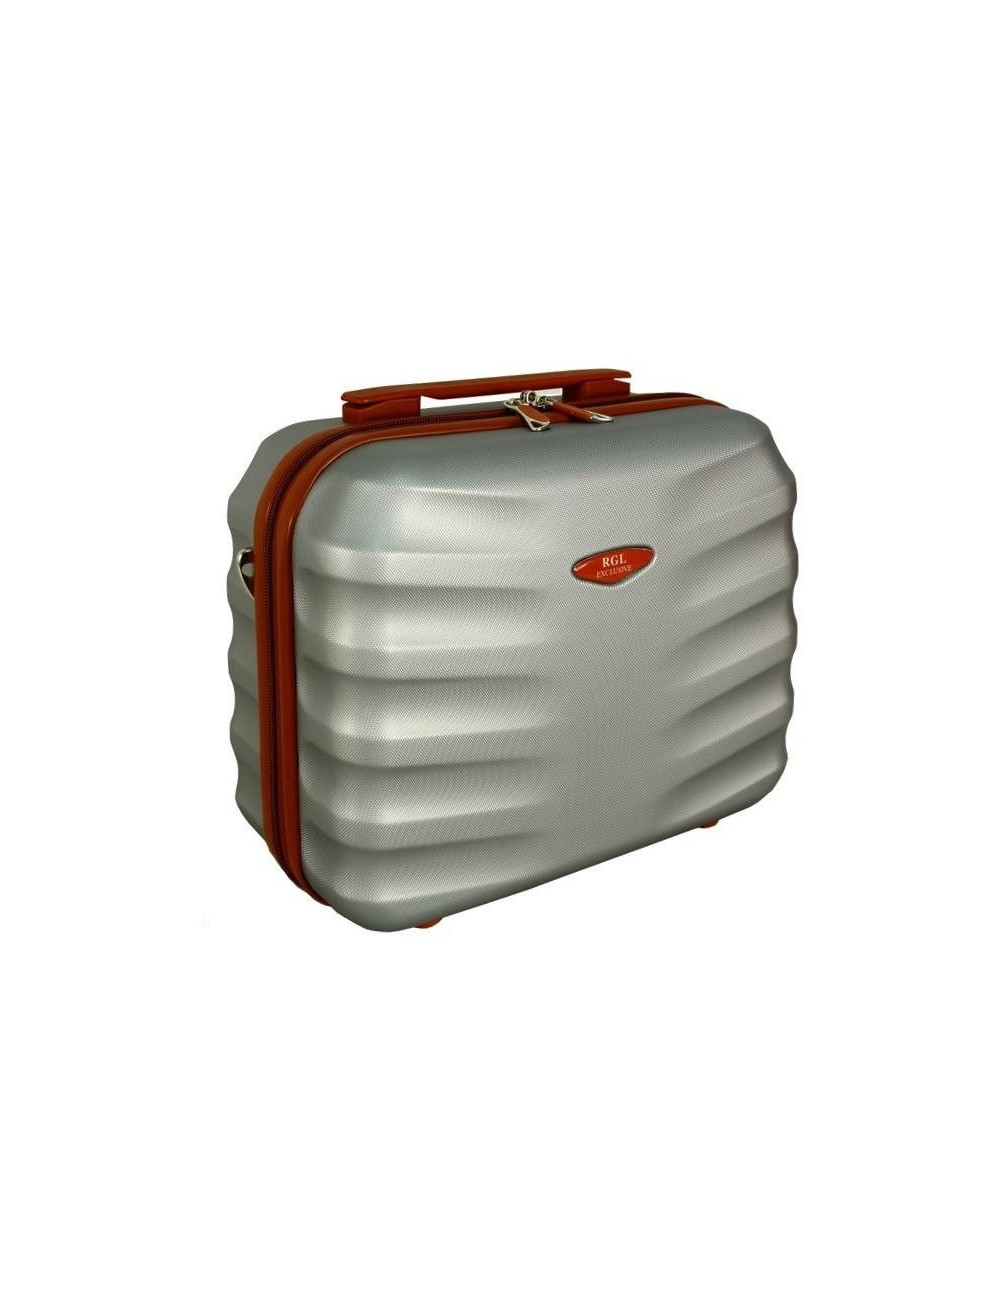 6881 RGL Średni Kuferek podróżny Carbon - srebrny